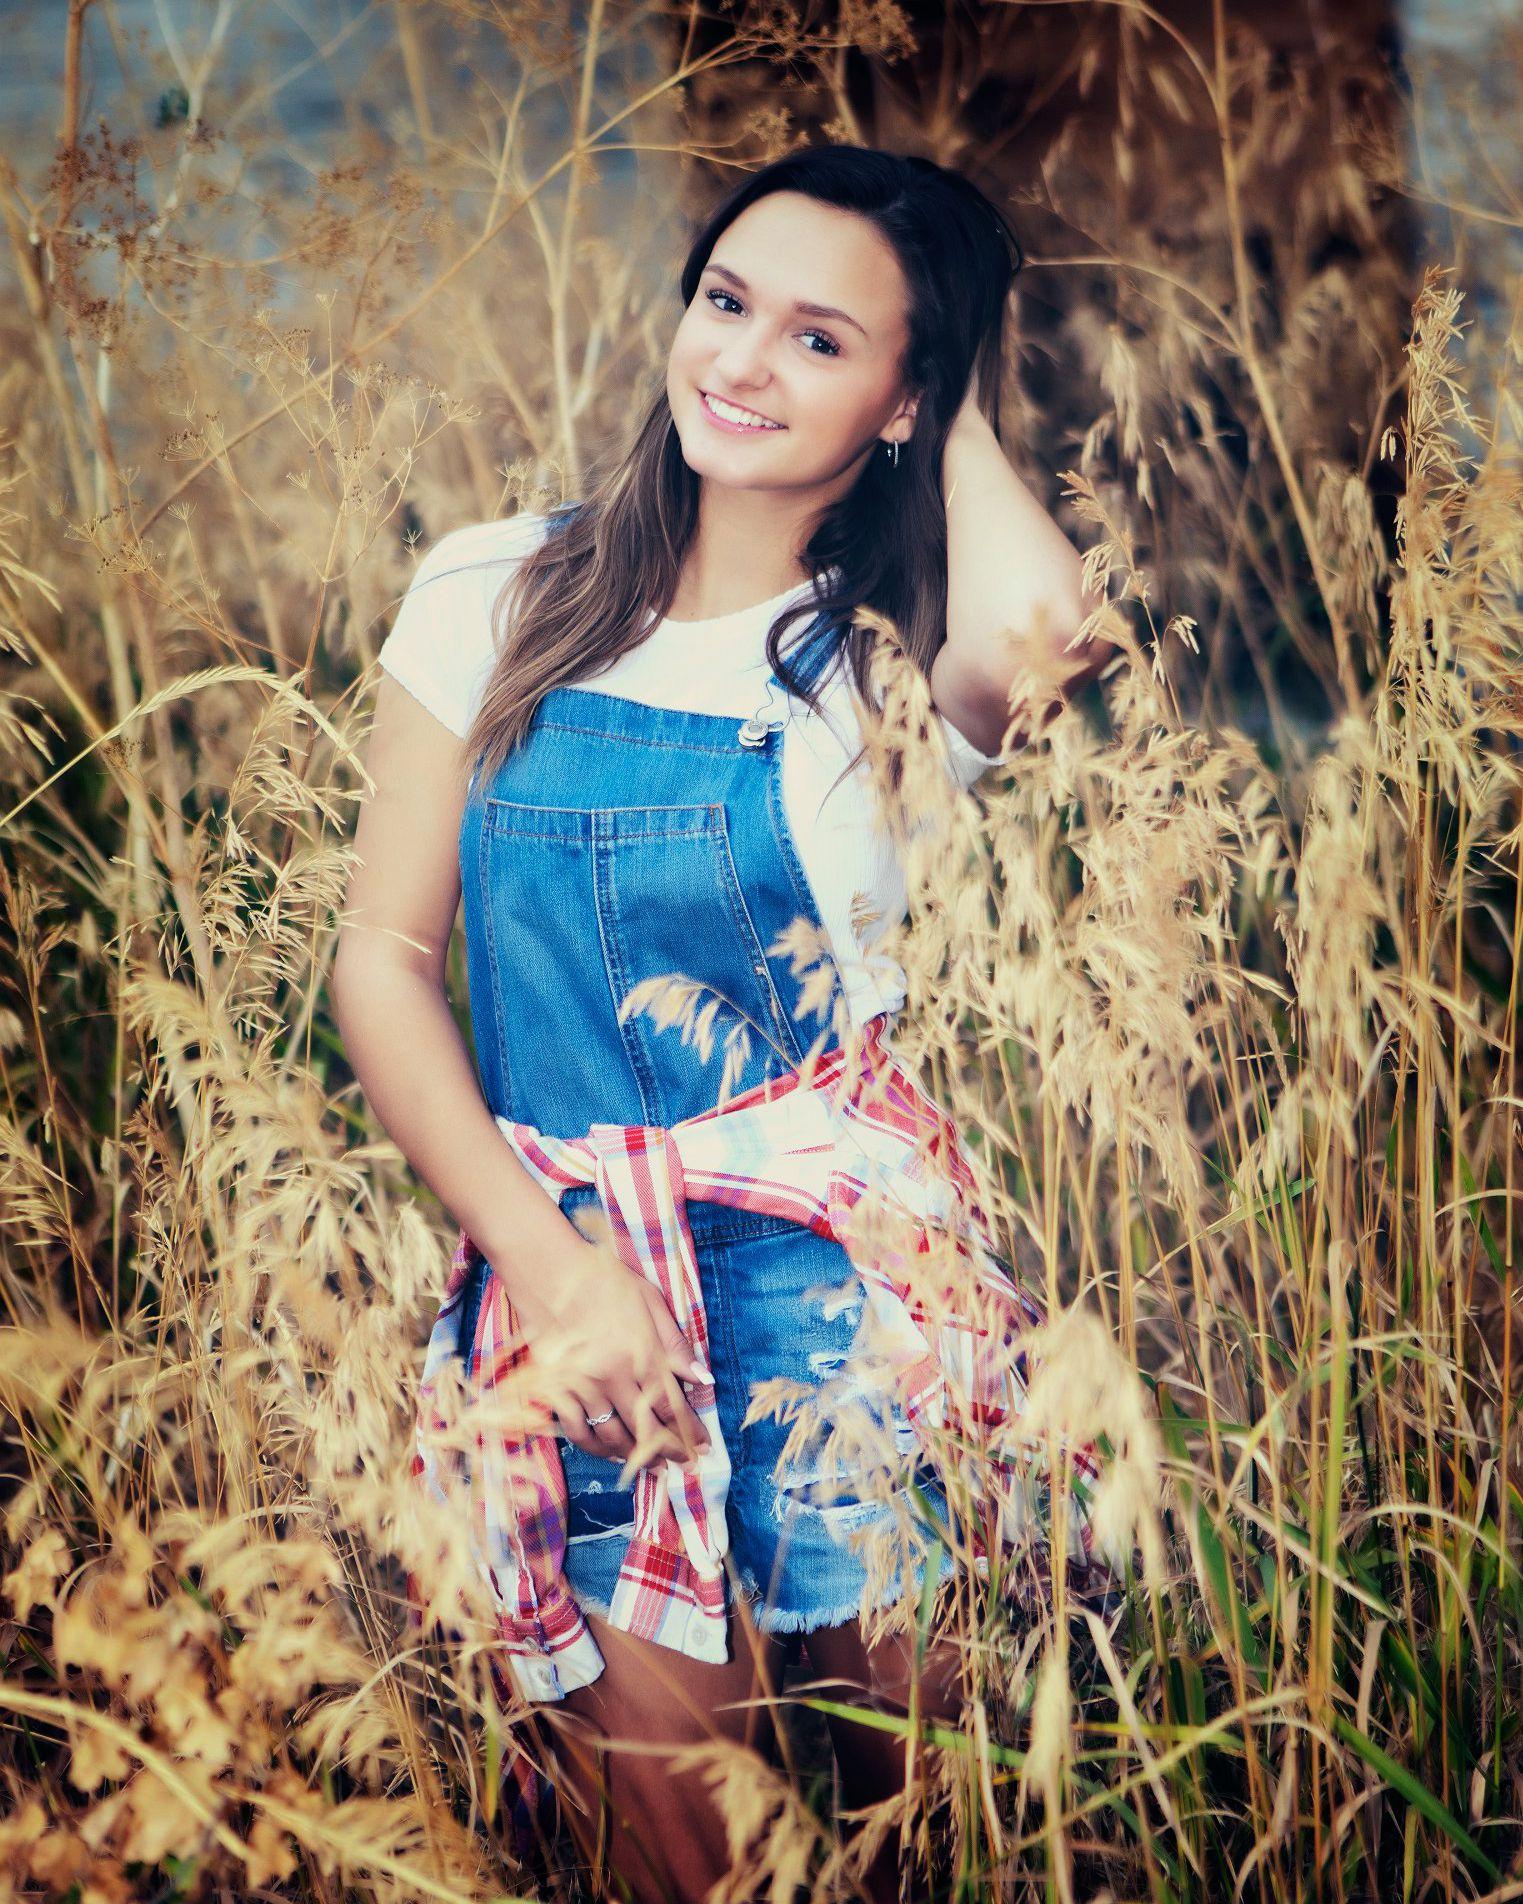 Woman standing in wild grass field